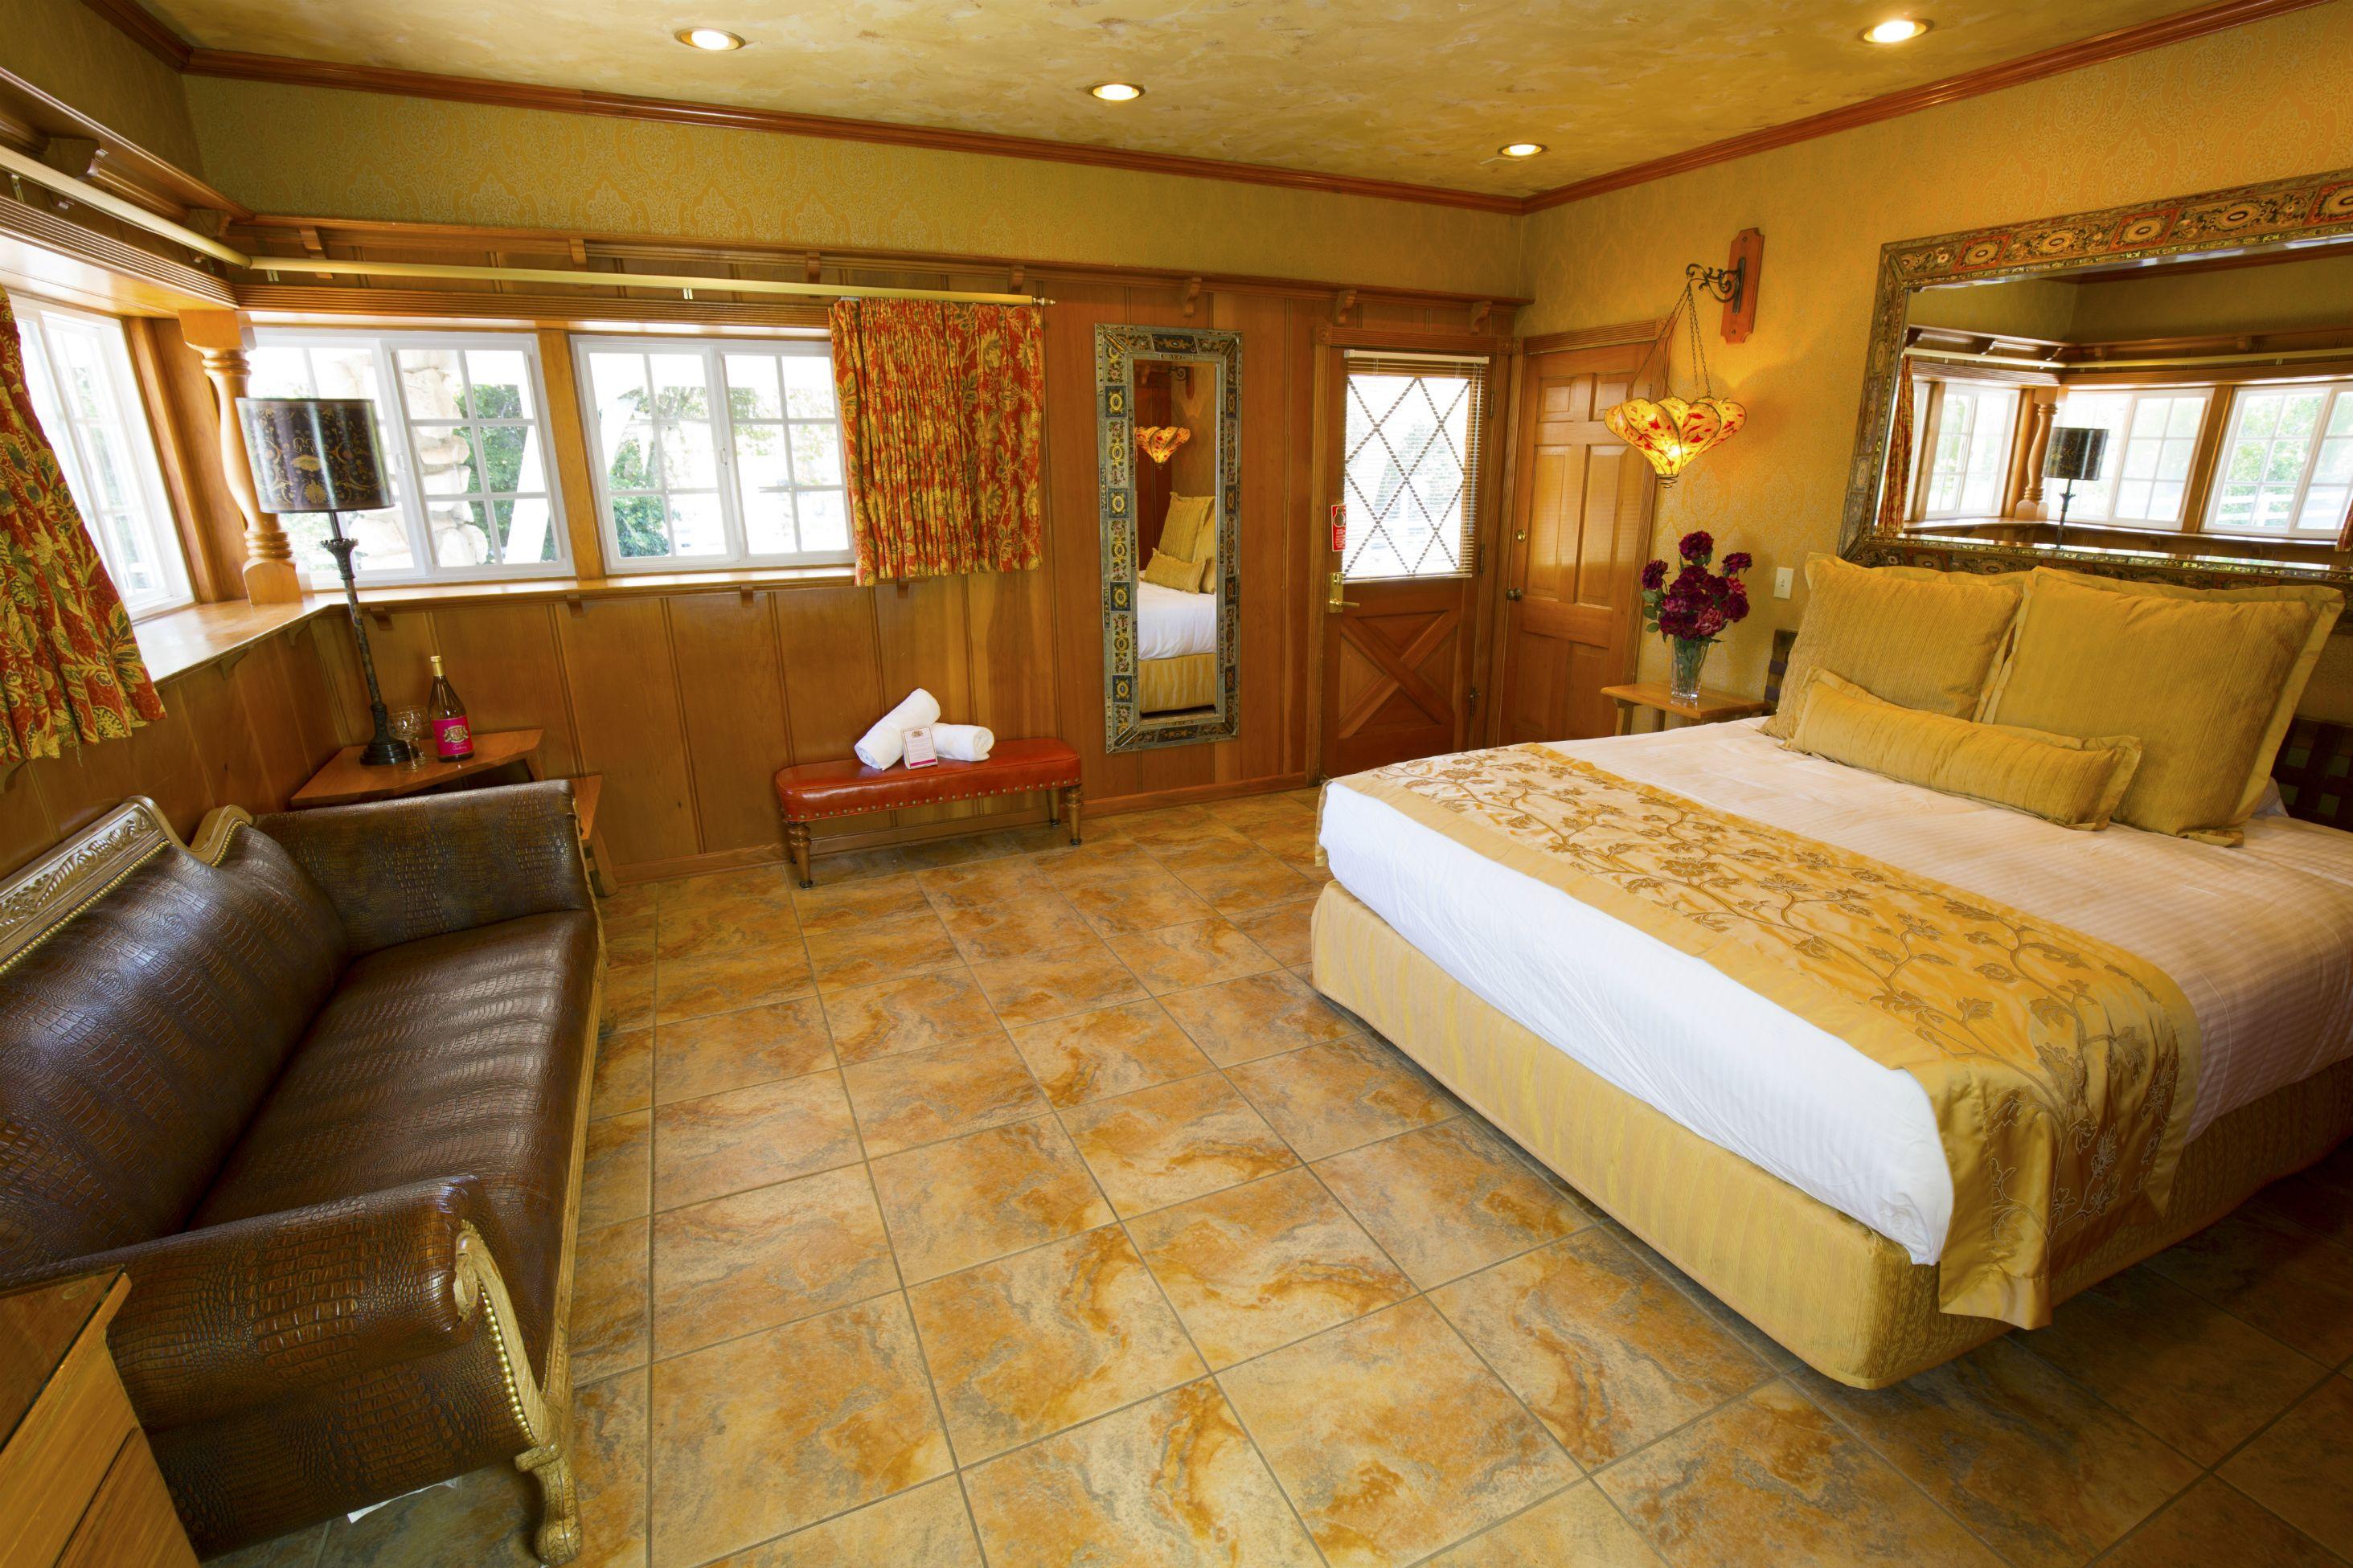 Desert Sands Room 115 110 Unique Hotel Rooms Room